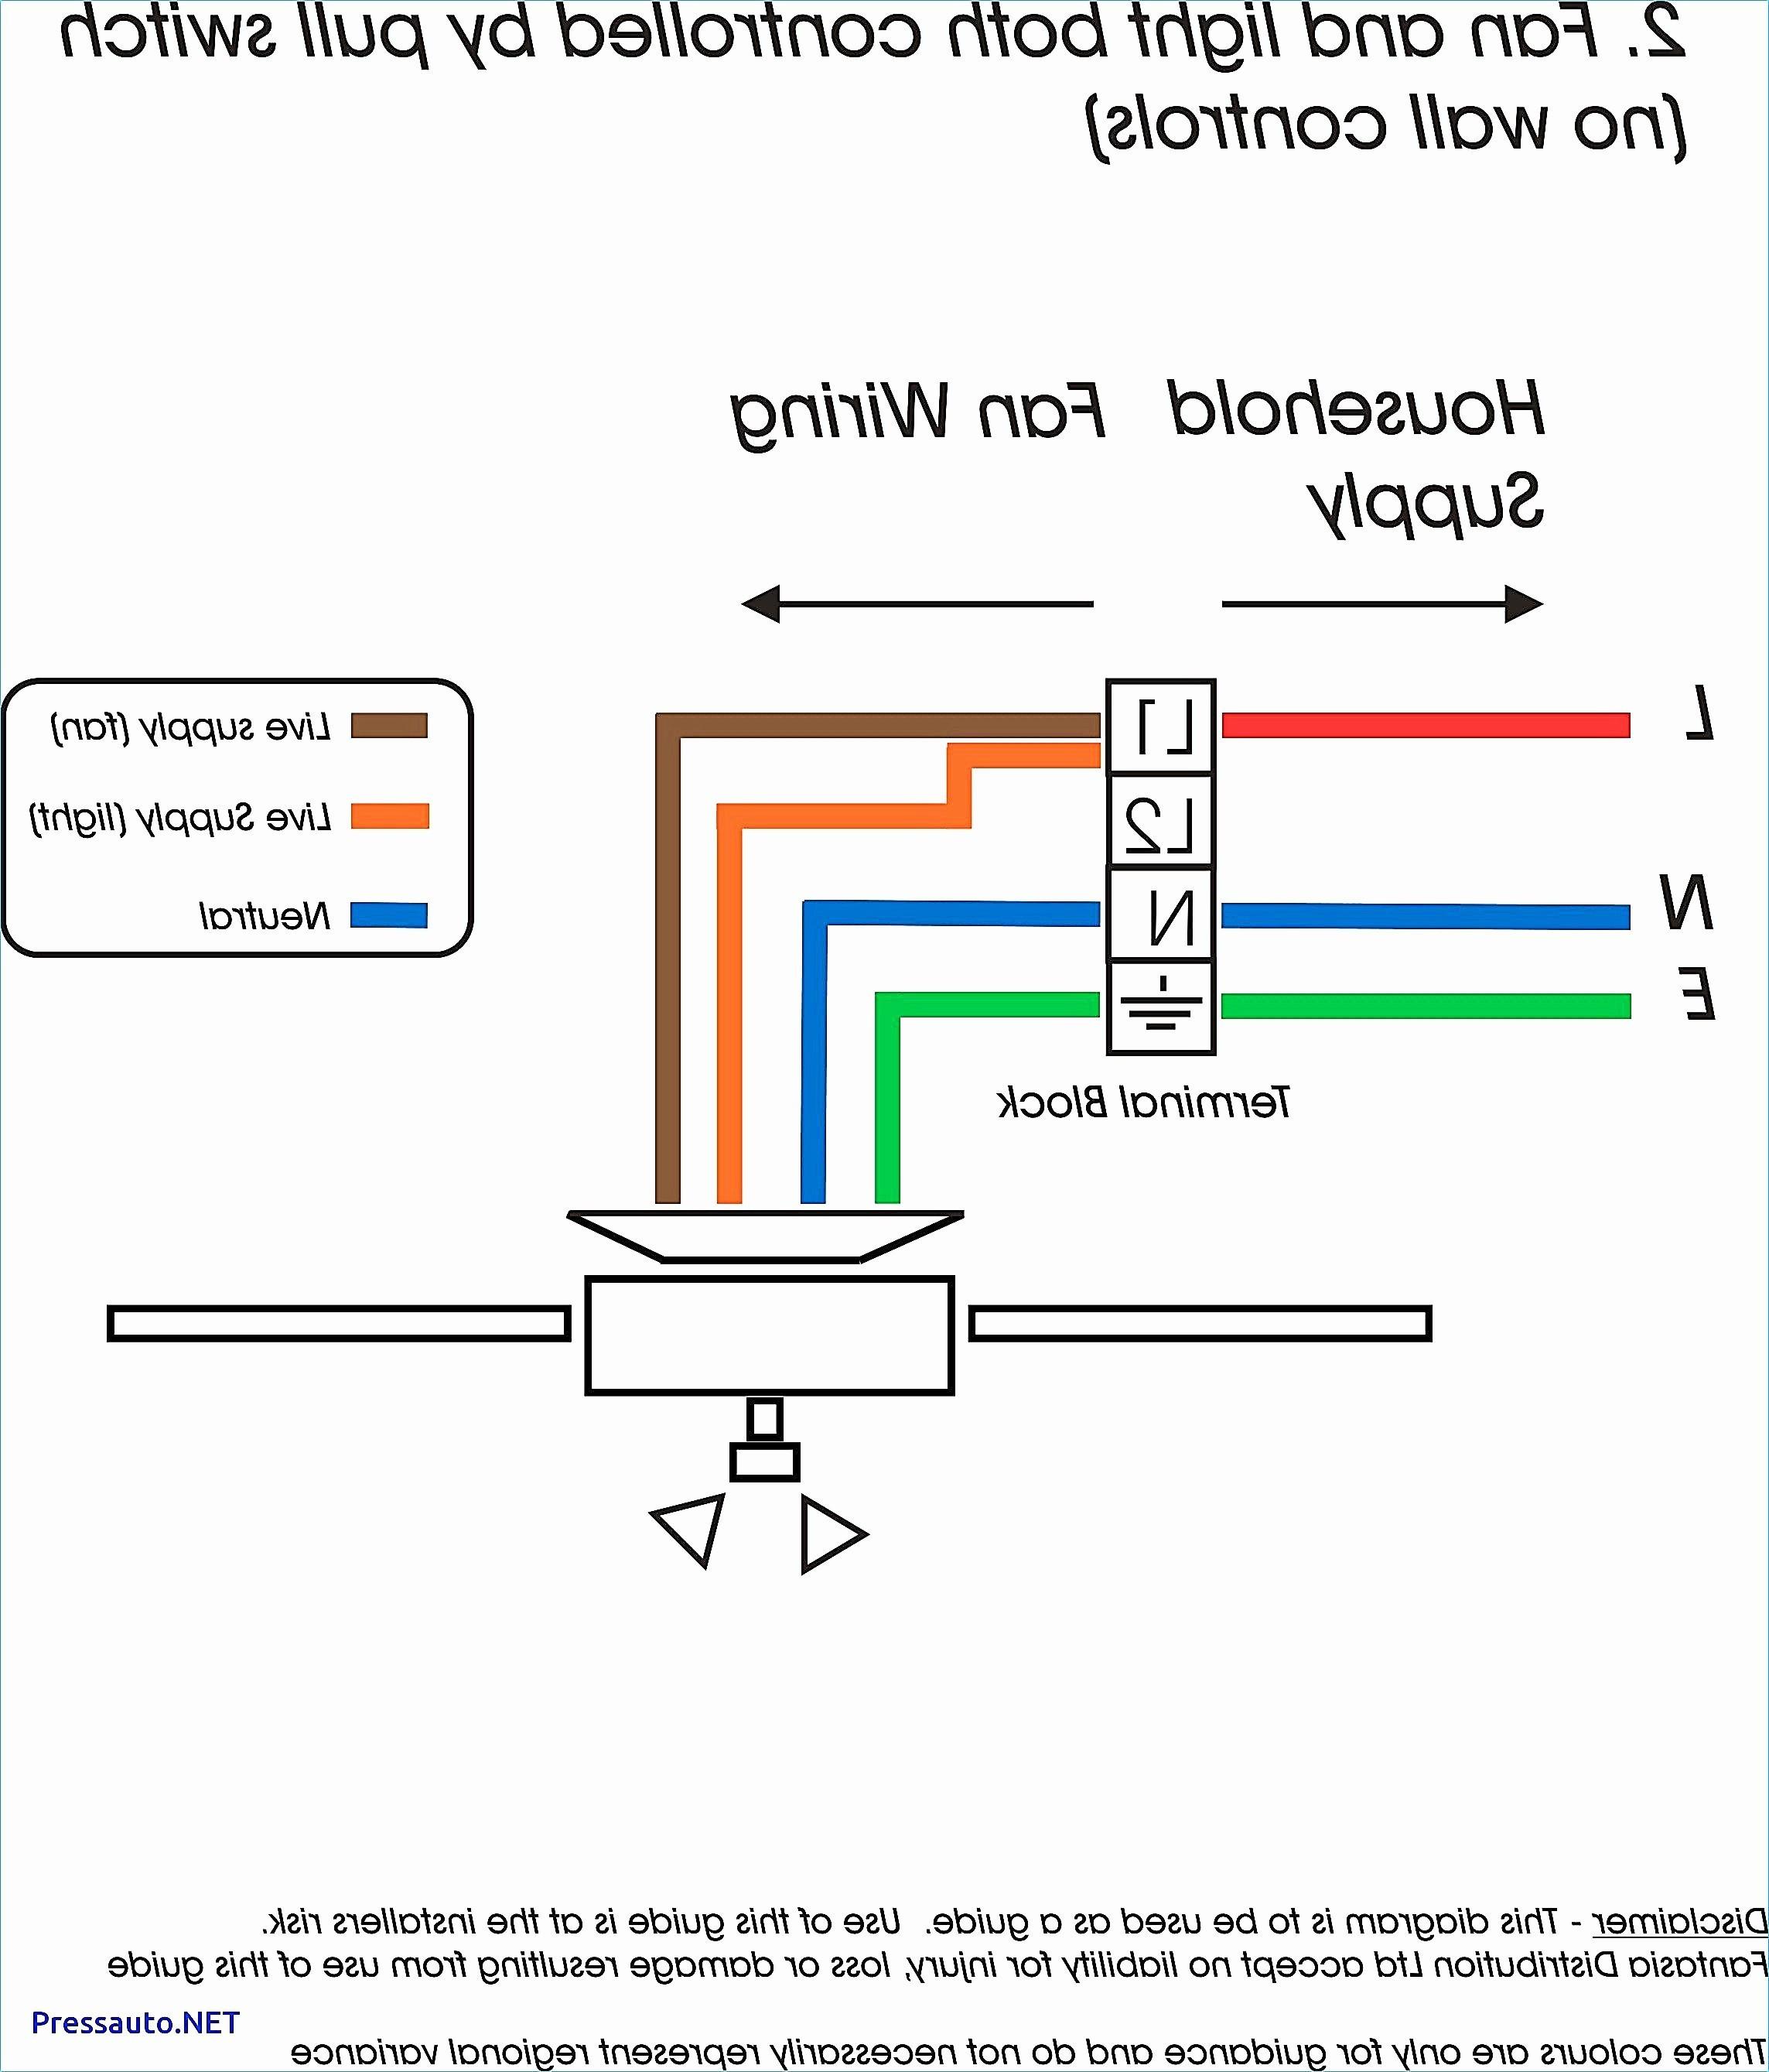 Vw Beetle Wiring Diagram Vw Wiring Diagram Best Home Hvac Wiring Diagram Best Wiring Of Vw Beetle Wiring Diagram